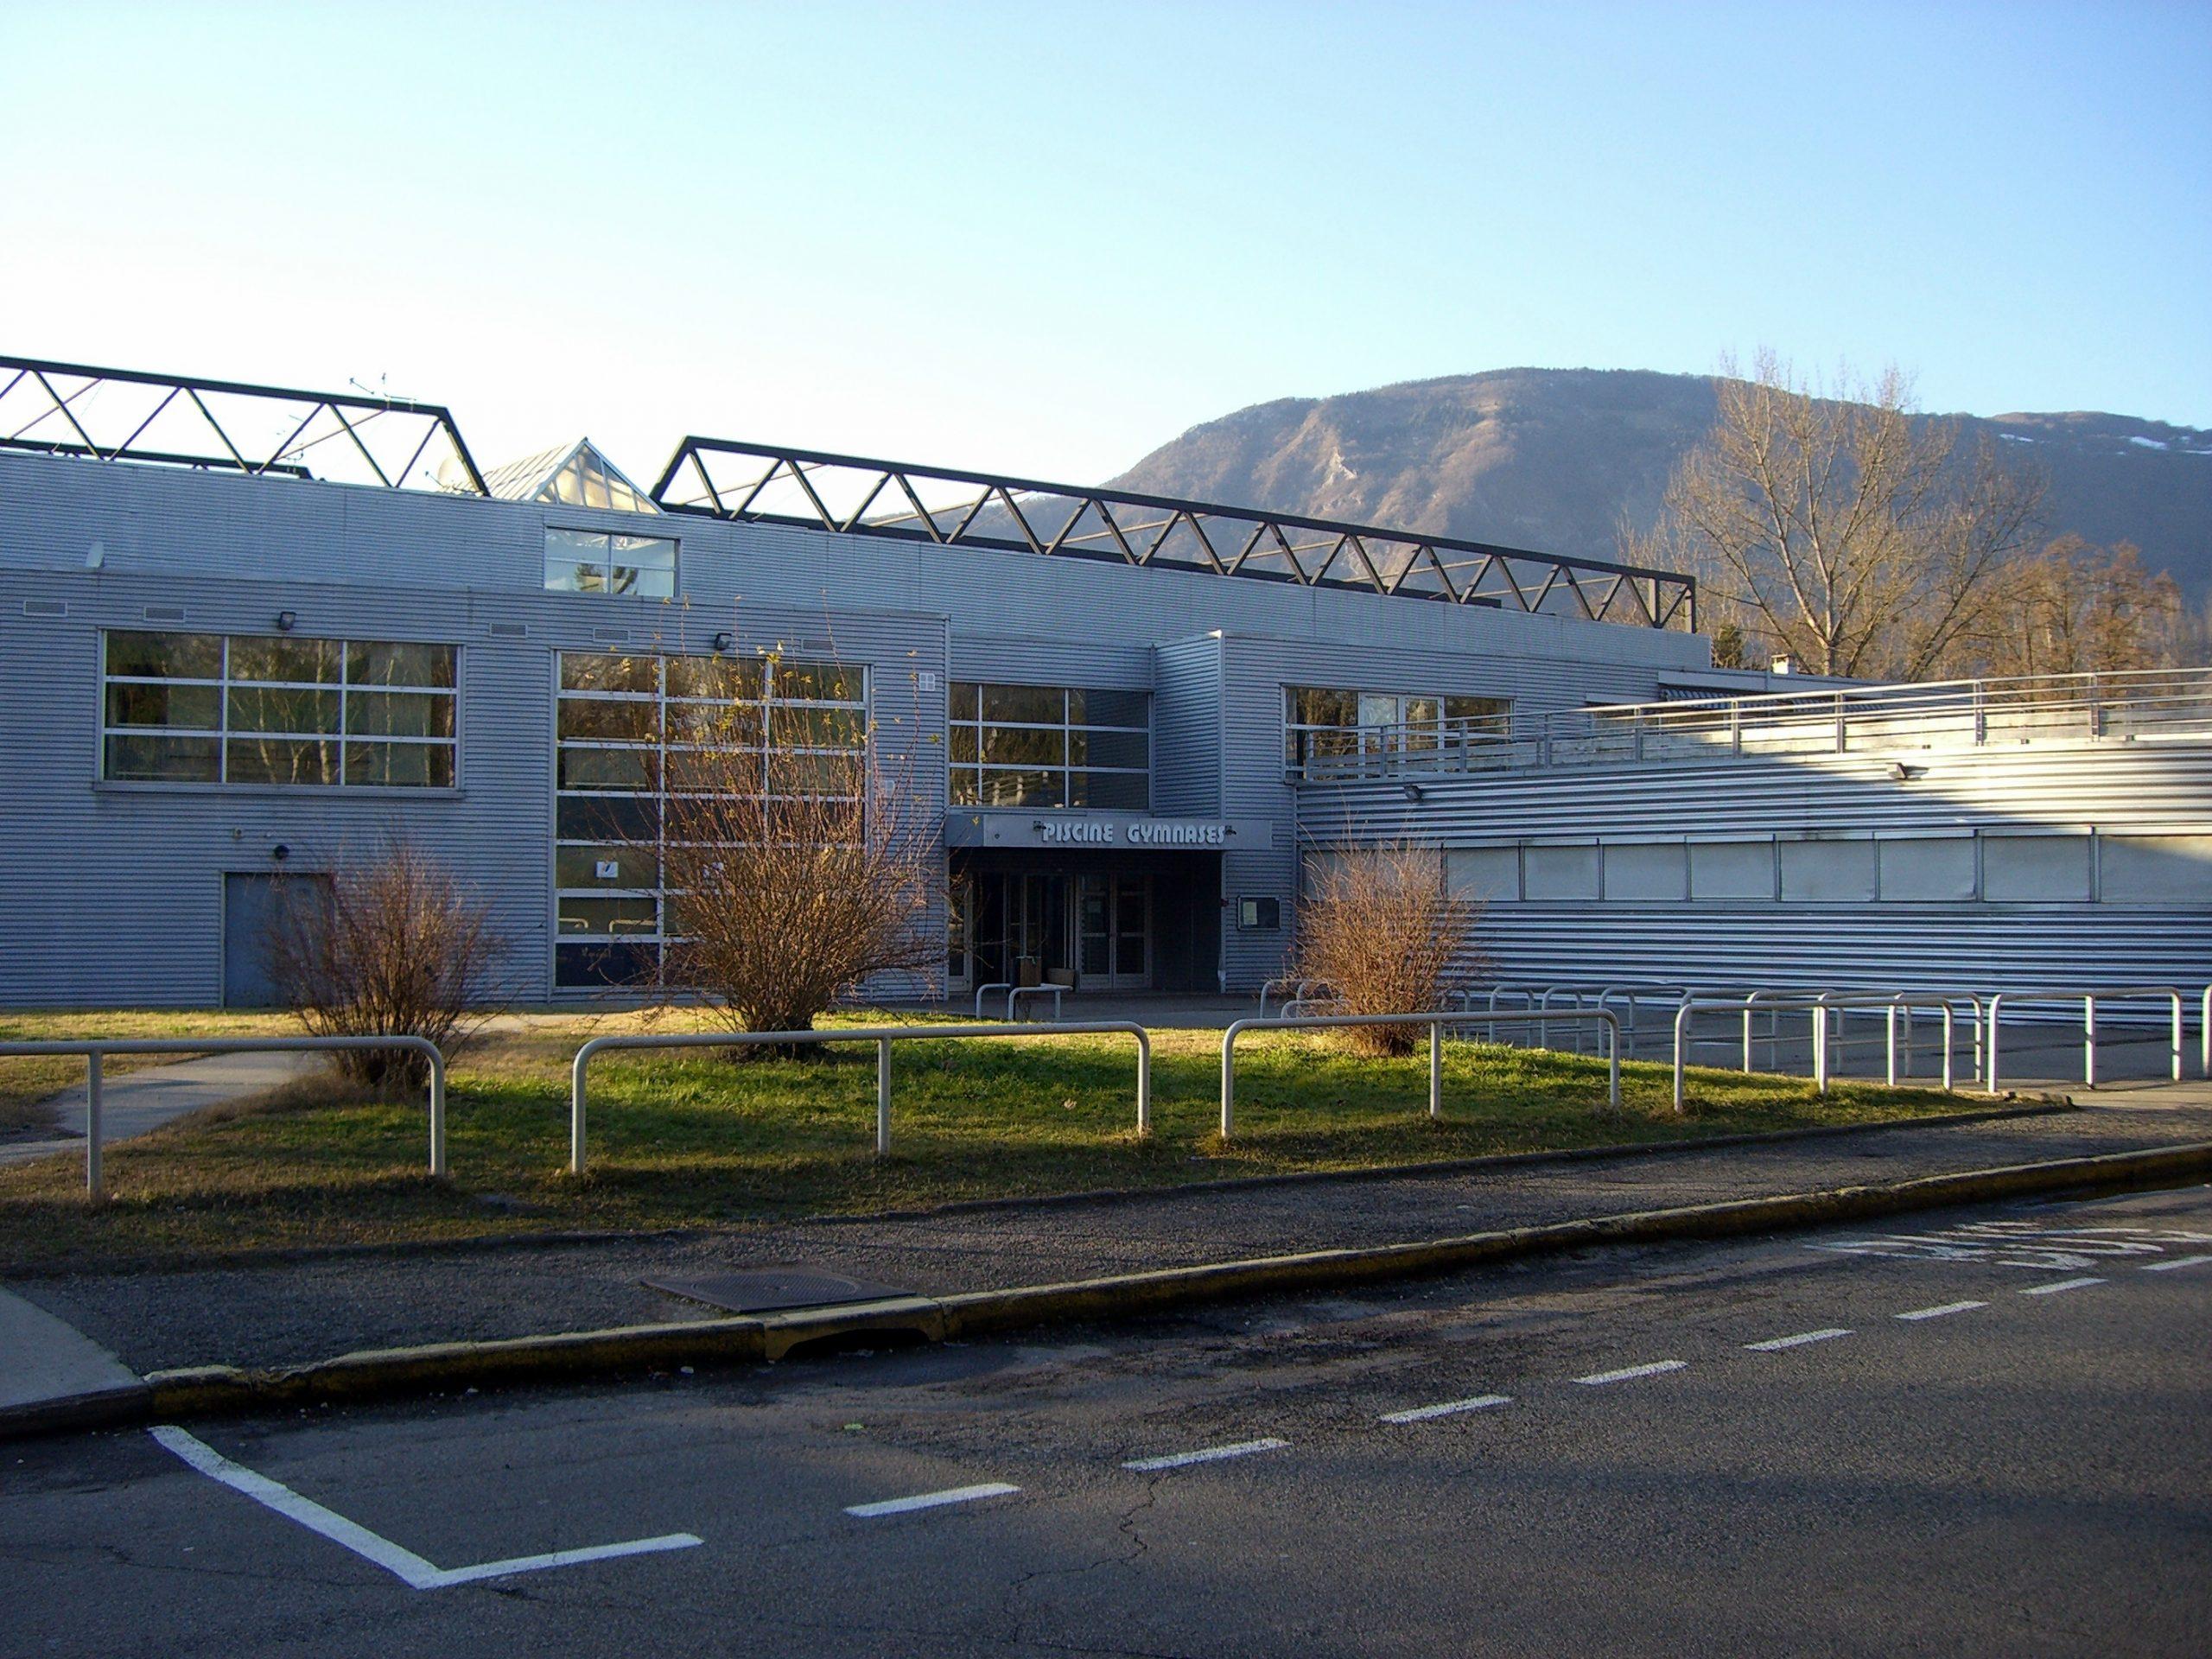 File:piscine Universitaire - Saint-Martin-D'hères.jpg ... encequiconcerne Piscine Saint Martin D Heres